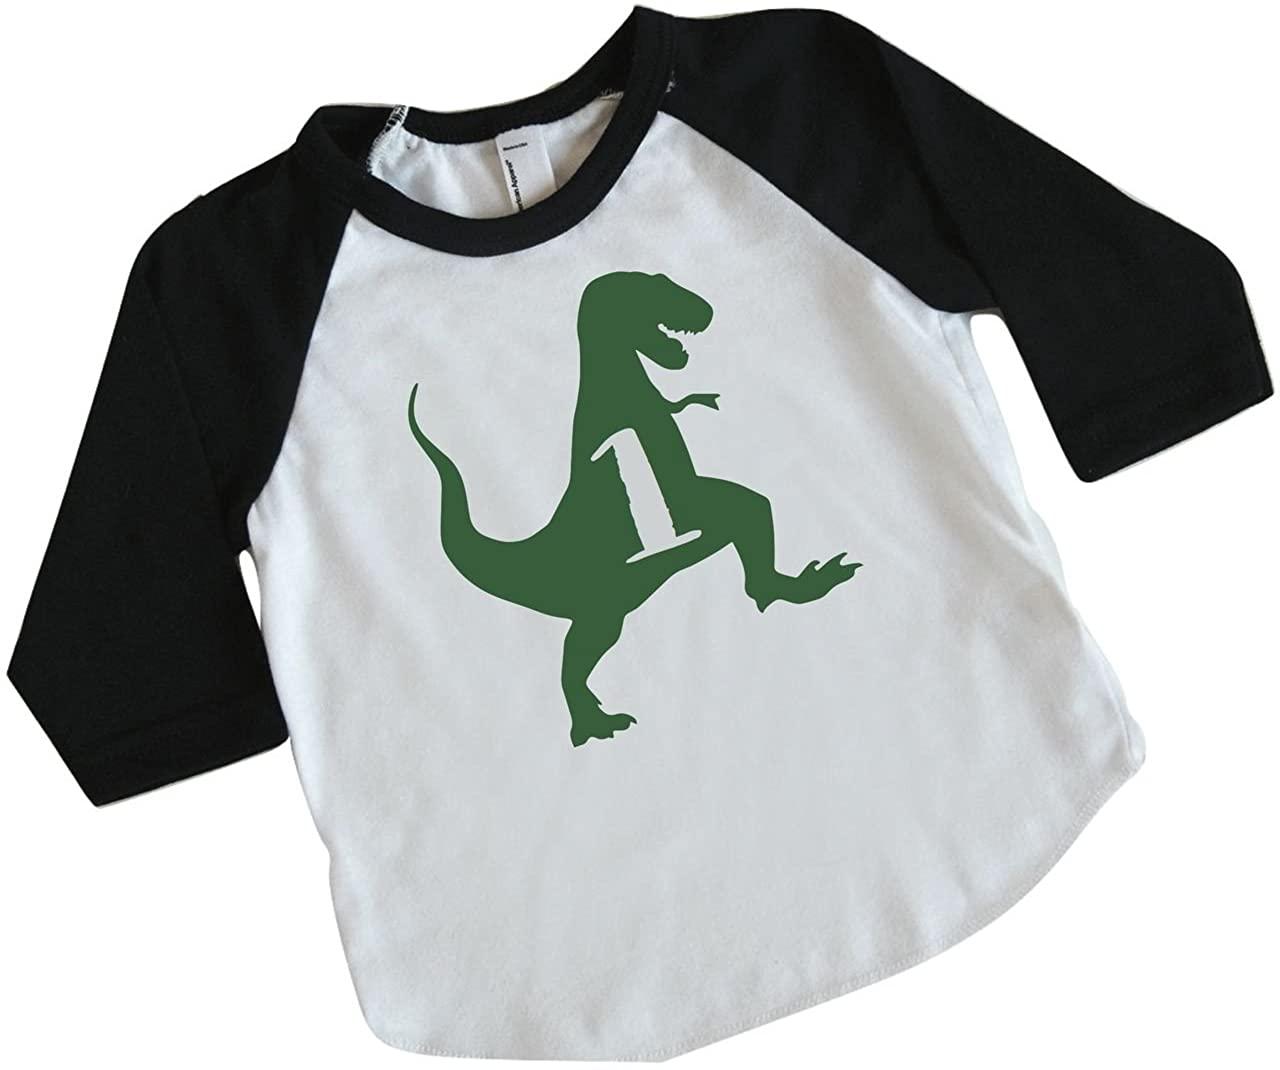 Bump and Beyond Designs Dinosaur Birthday Shirt Boy 1st Birthday Outfit Dino Birthday